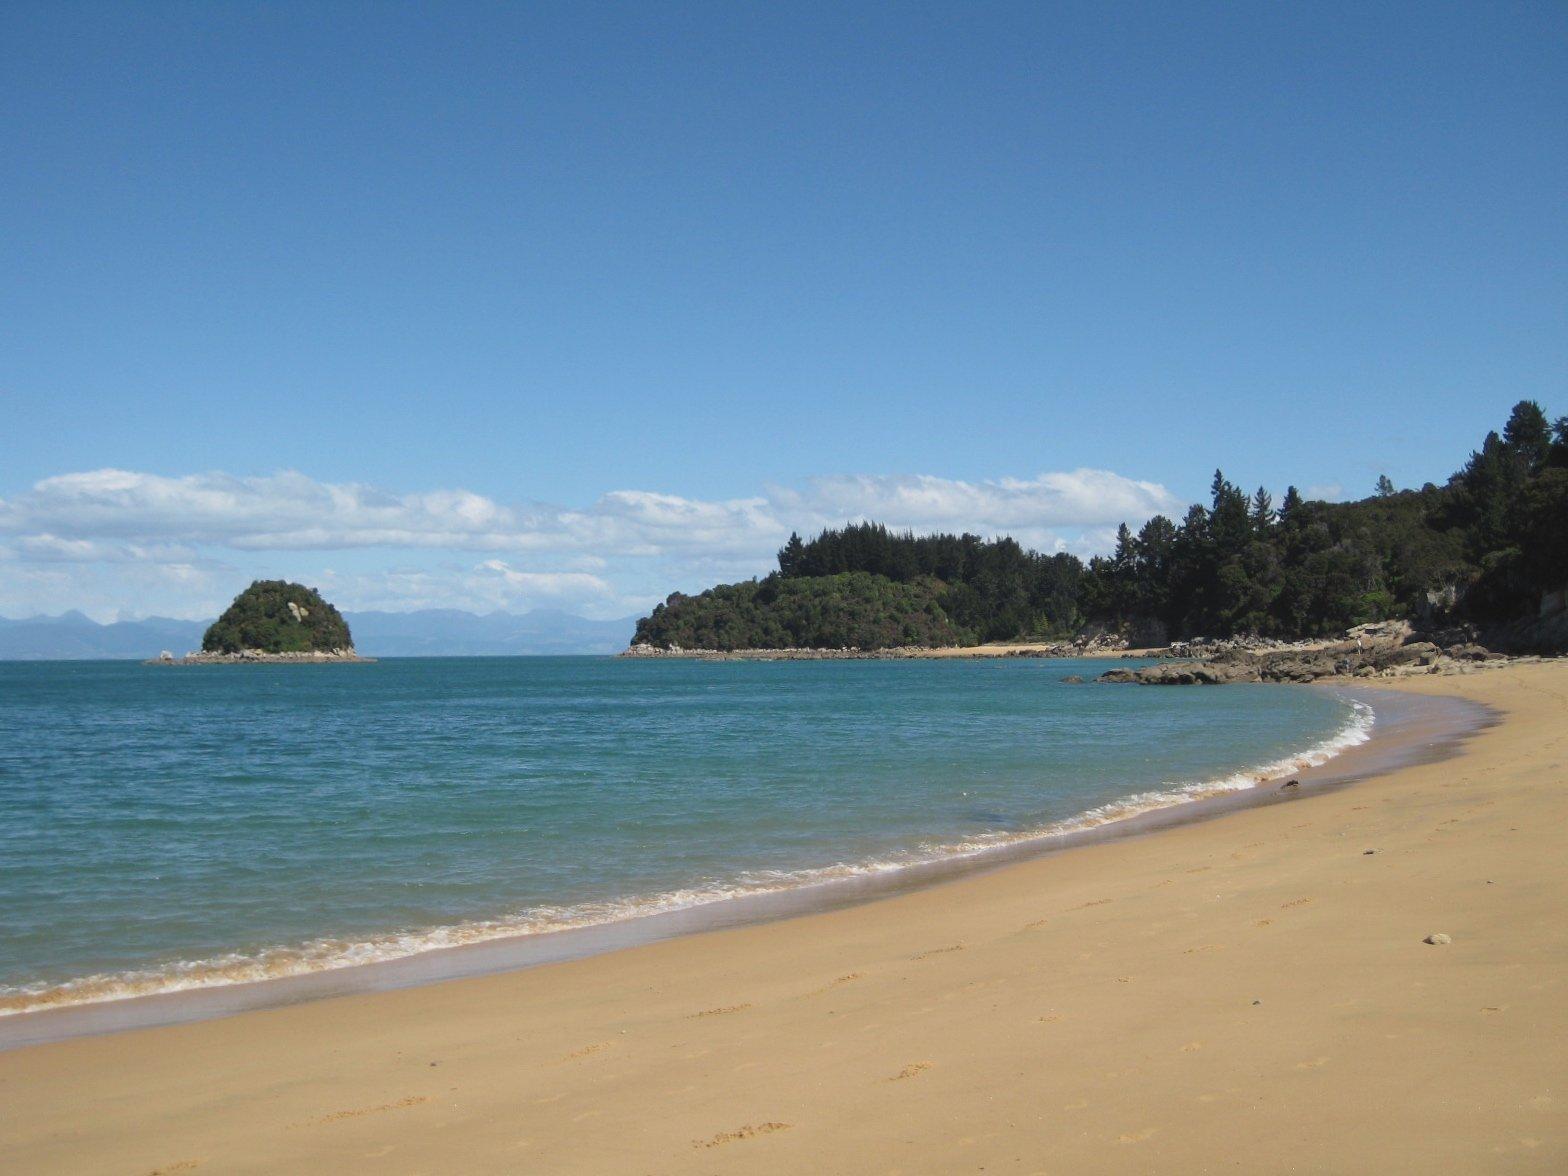 Sandy Beach with Trees